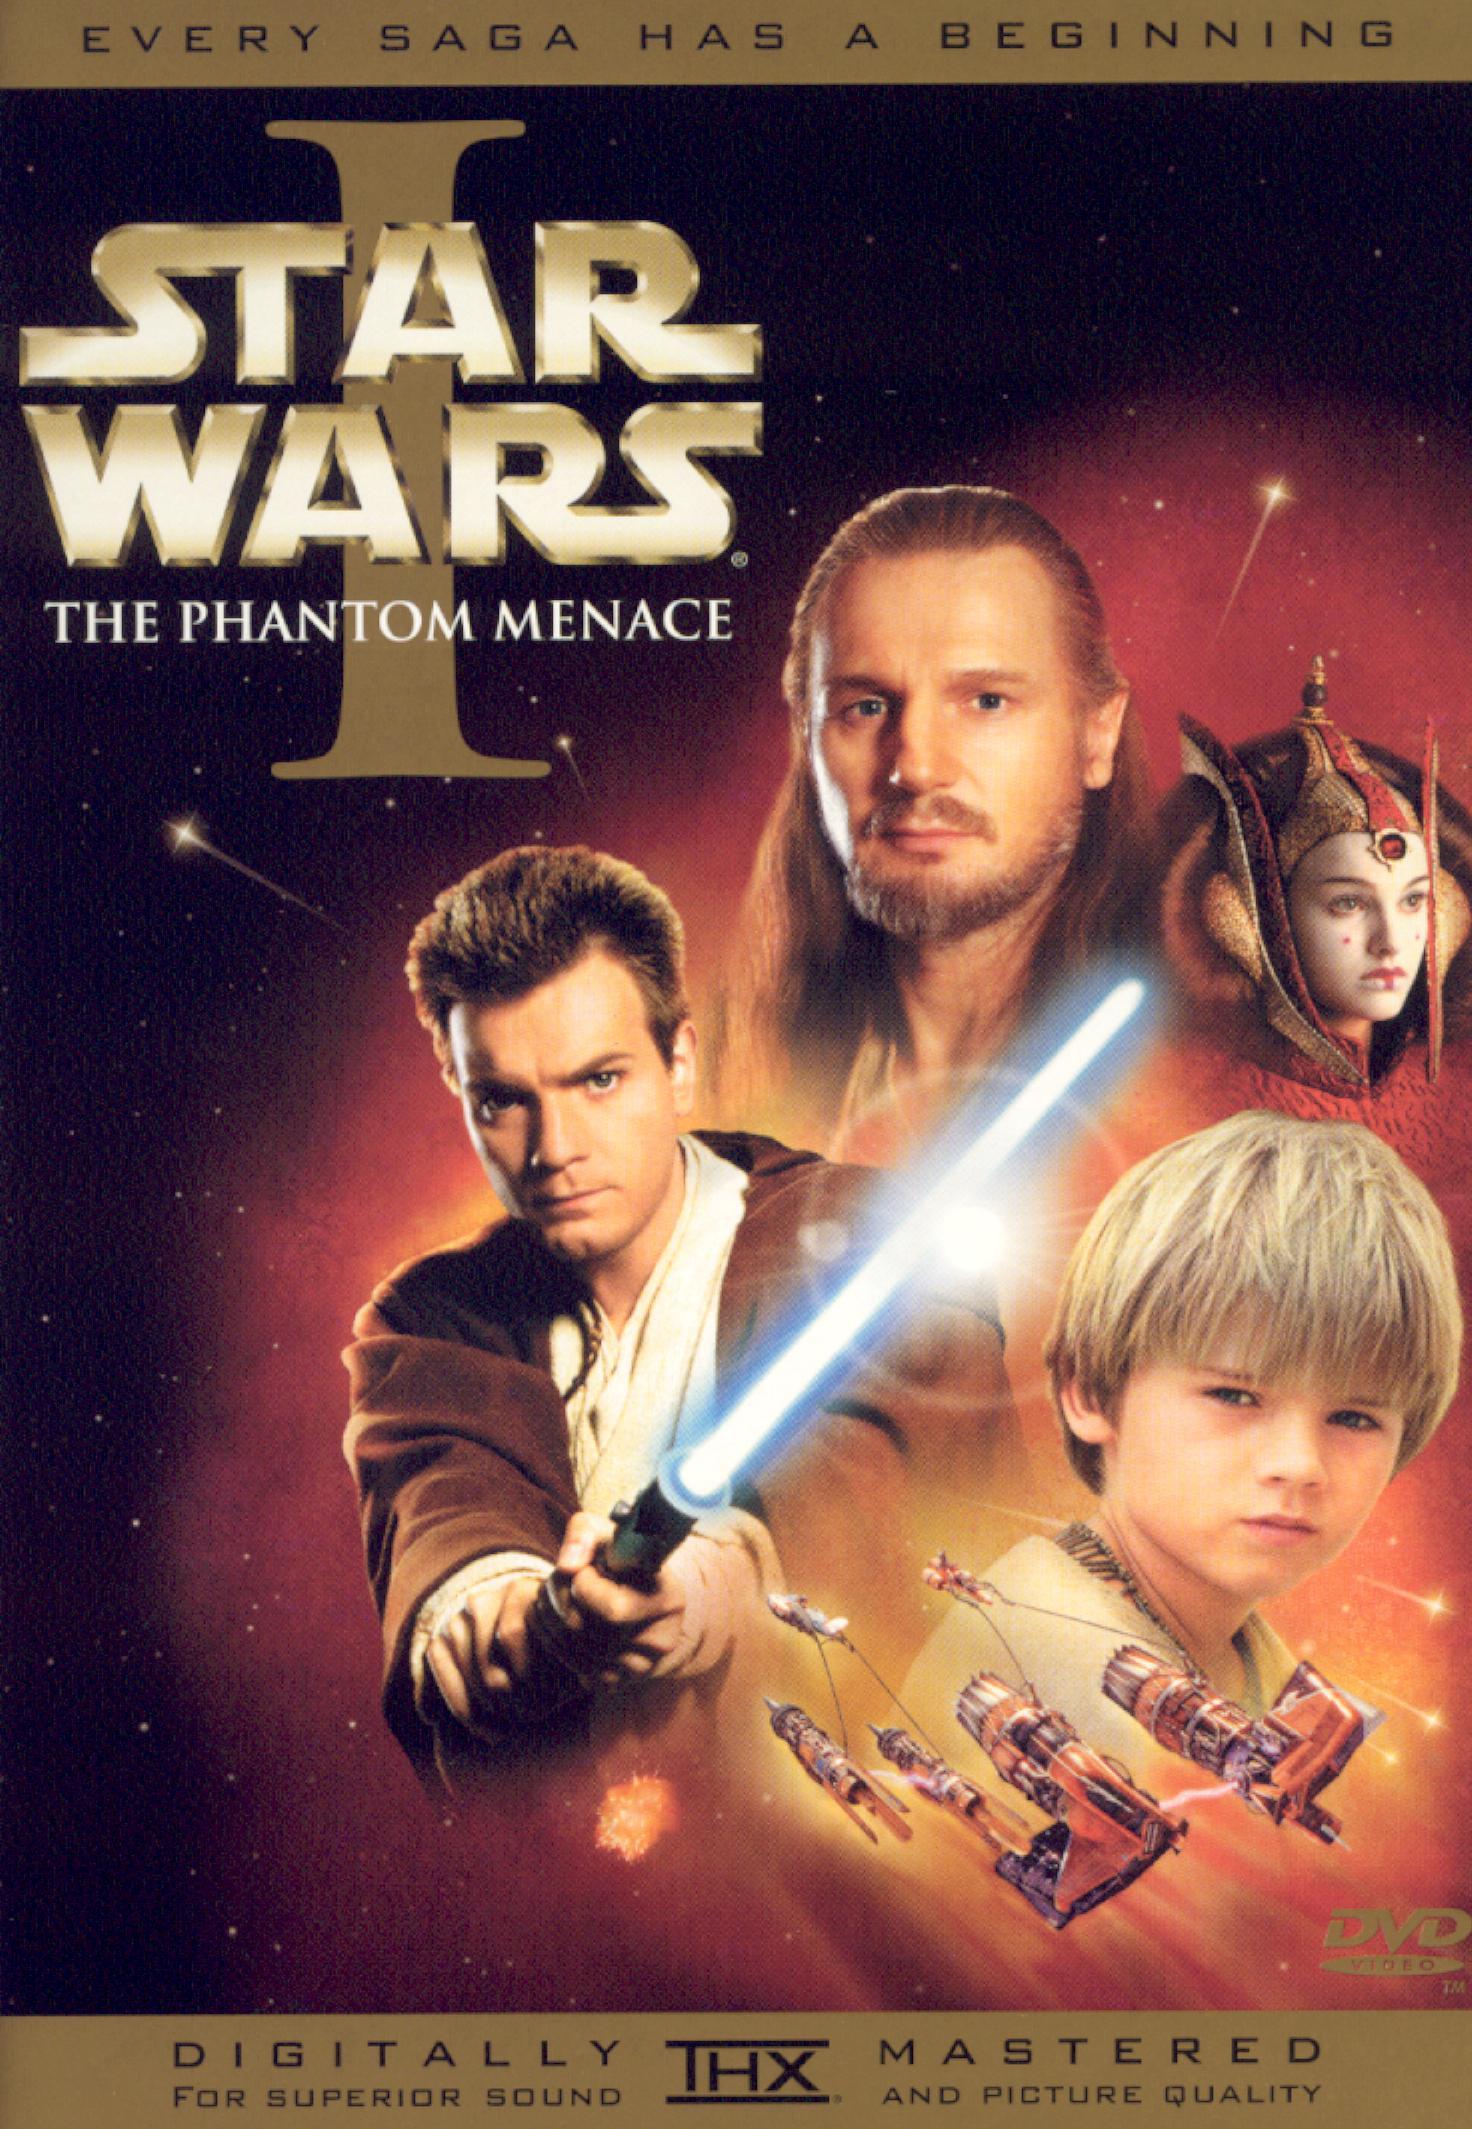 *NEW* Star Wars Wall Poster Movie Film Phantom Menace Battle Episode 1